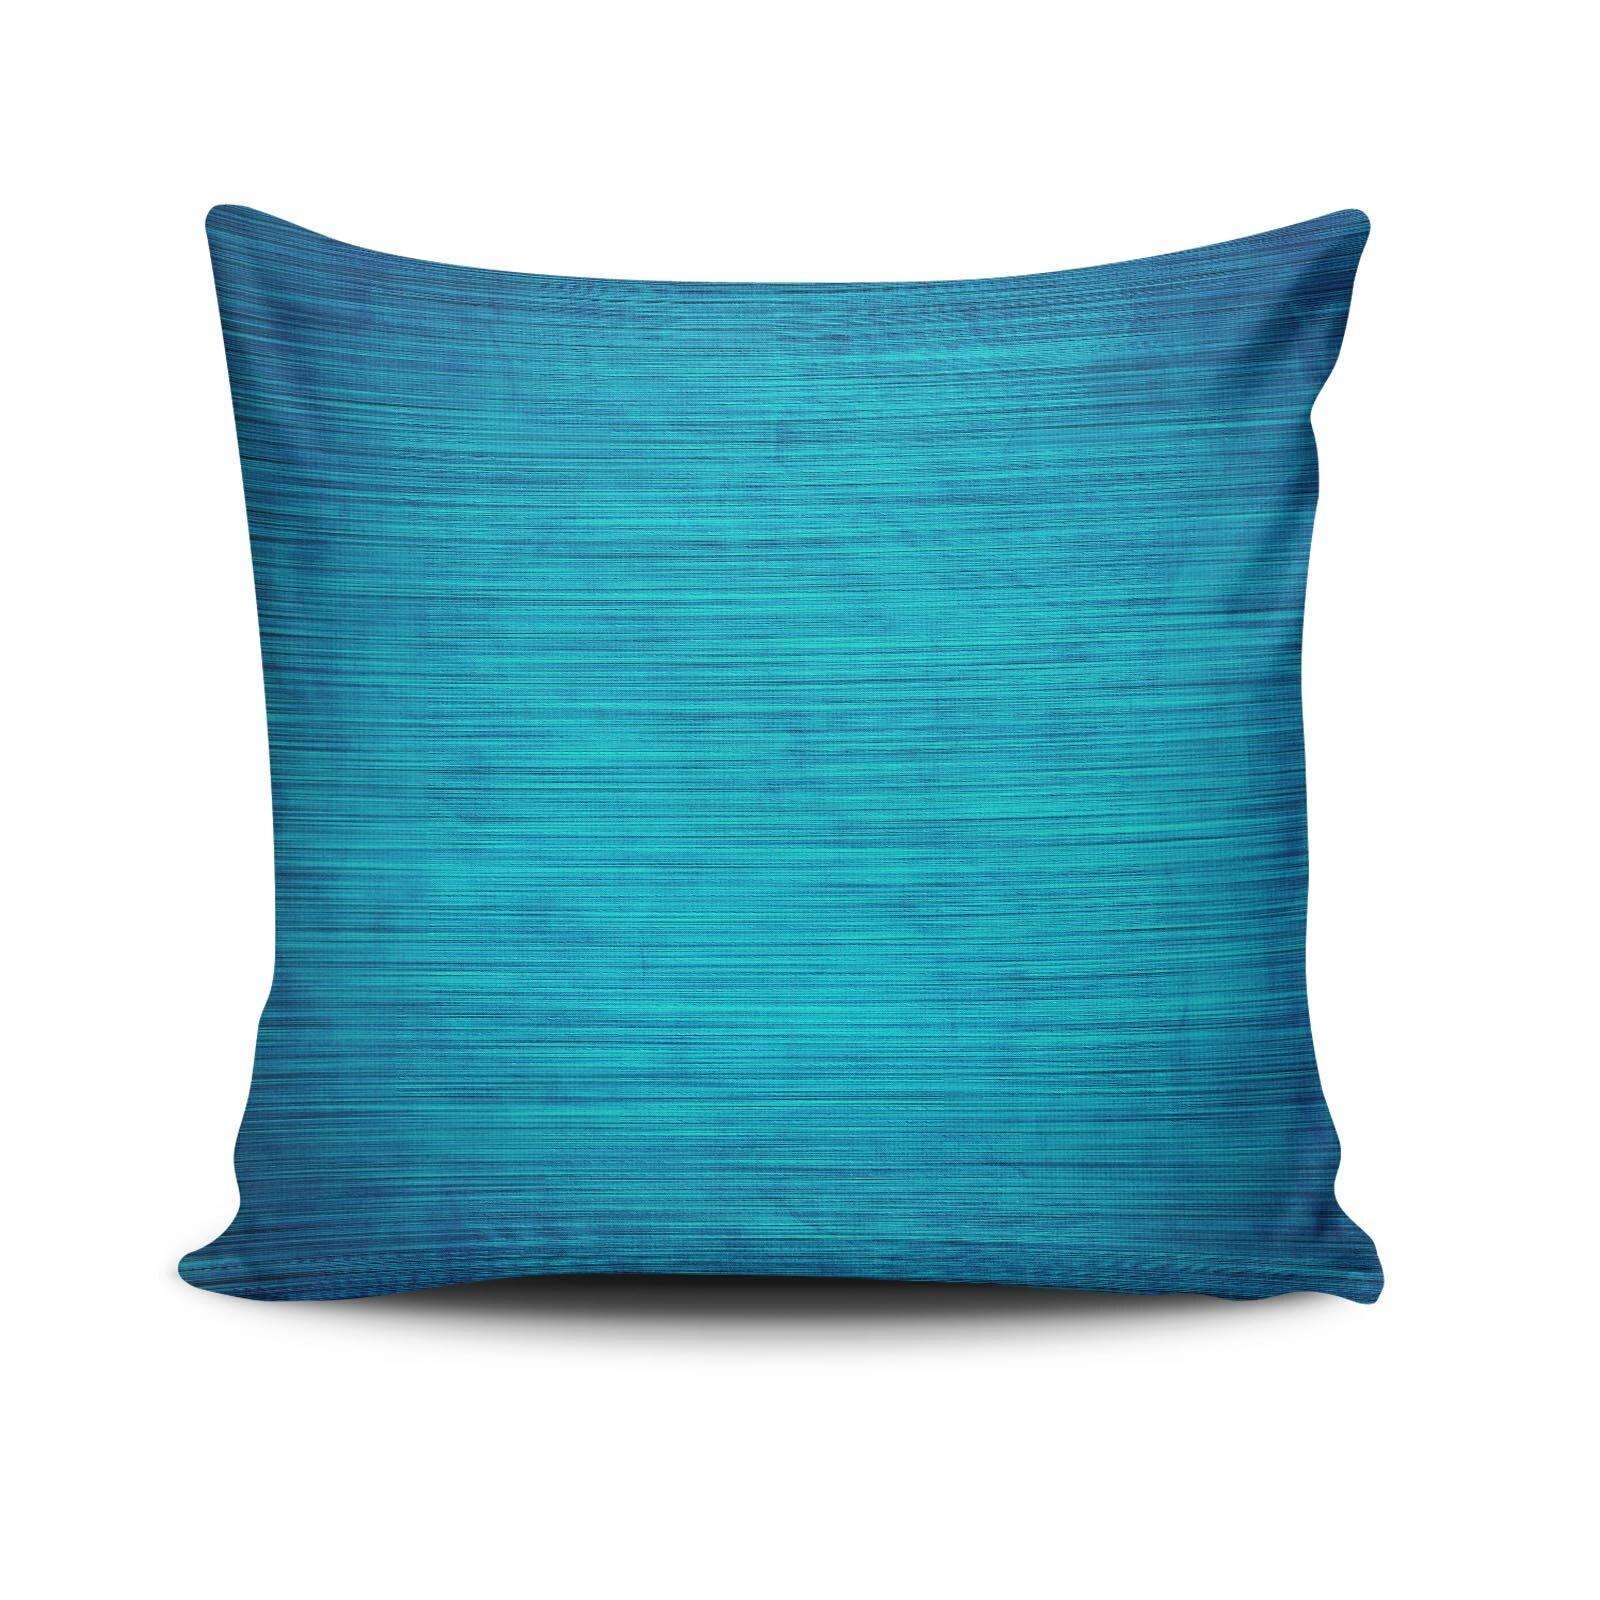 Perna decorativa Cushion Love, Dimensiune: 45 x 45 cm, Material exterior: 50% bumbac / 50% poliester 768CLV0281